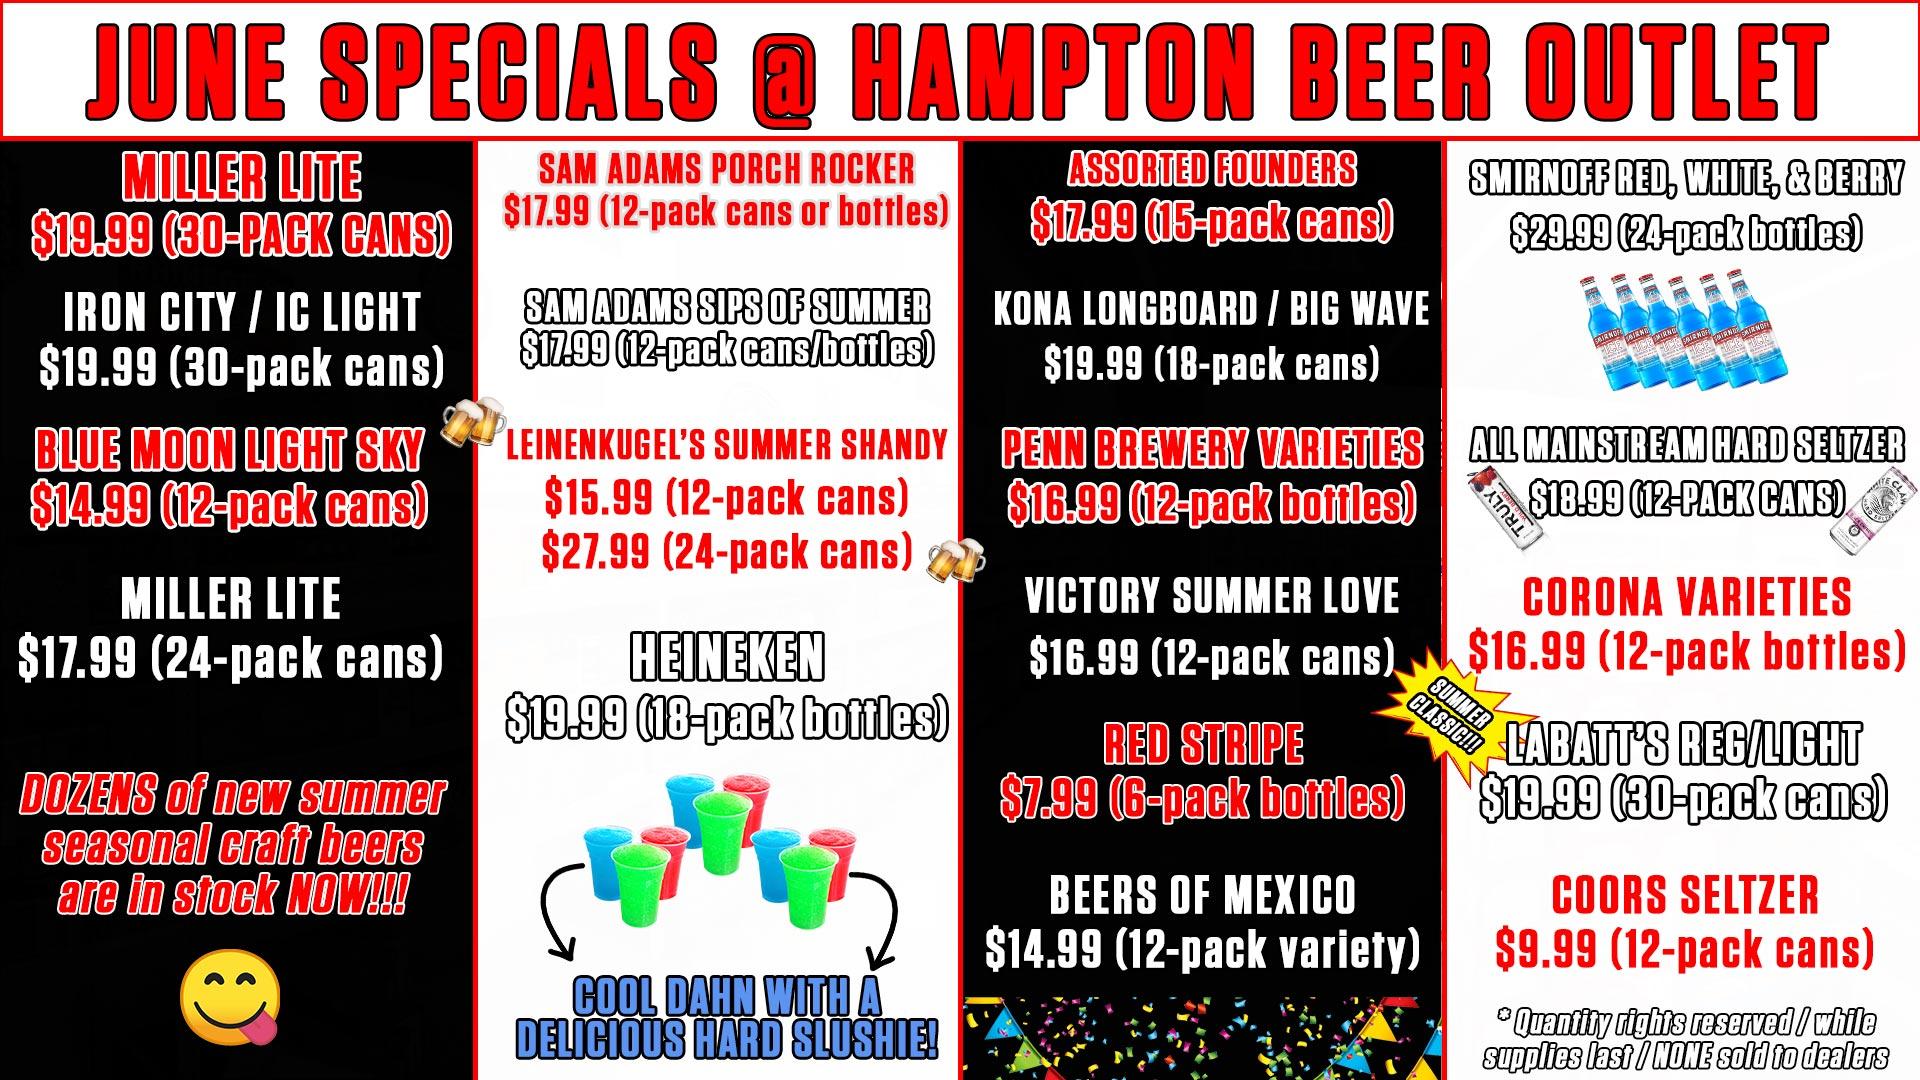 hampton-beer-outlet-pittsburgh-june-specials